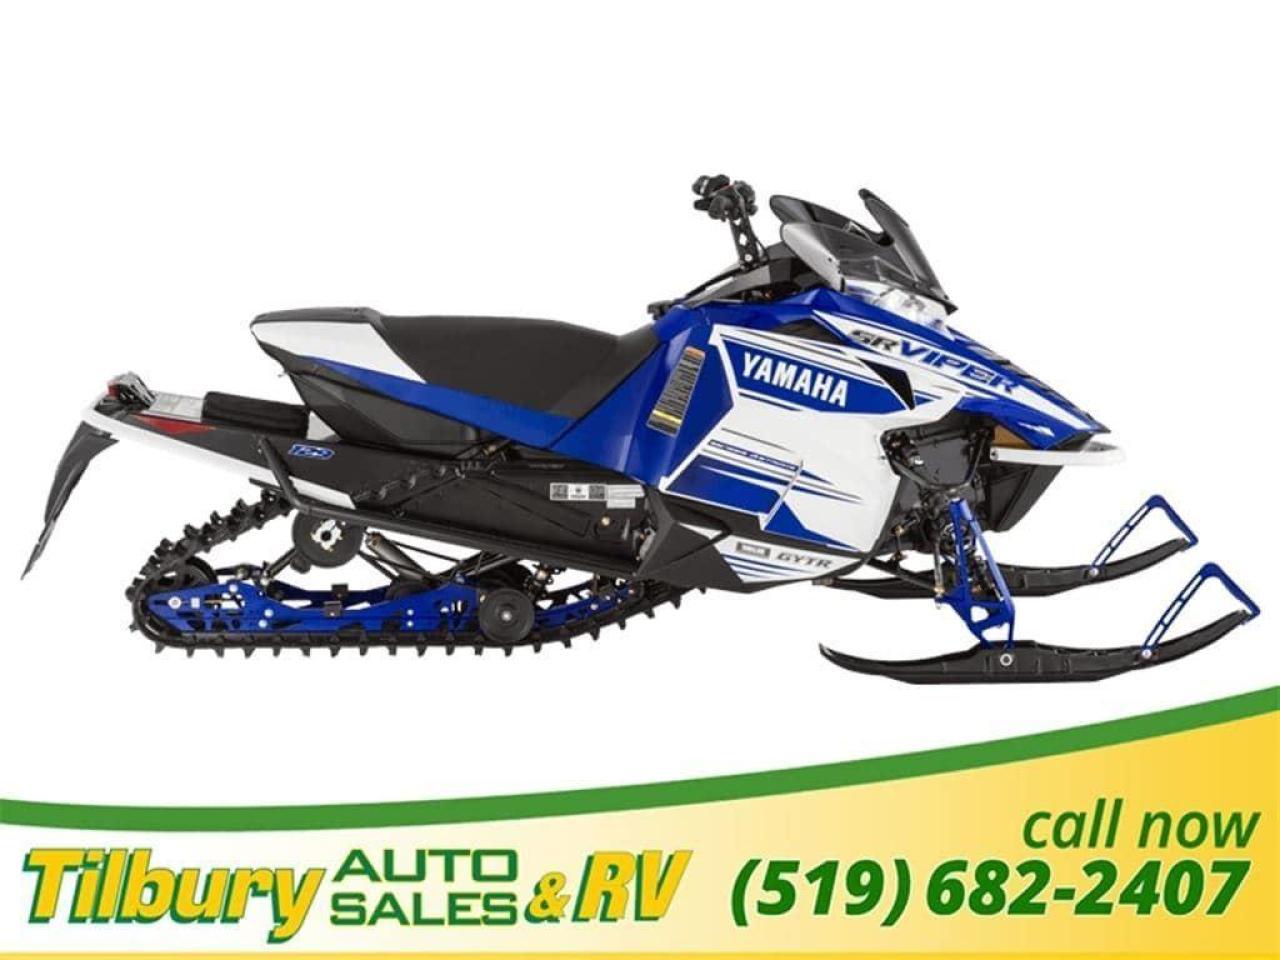 2017 Yamaha SRVIPER R-TX Hot snowmobile!